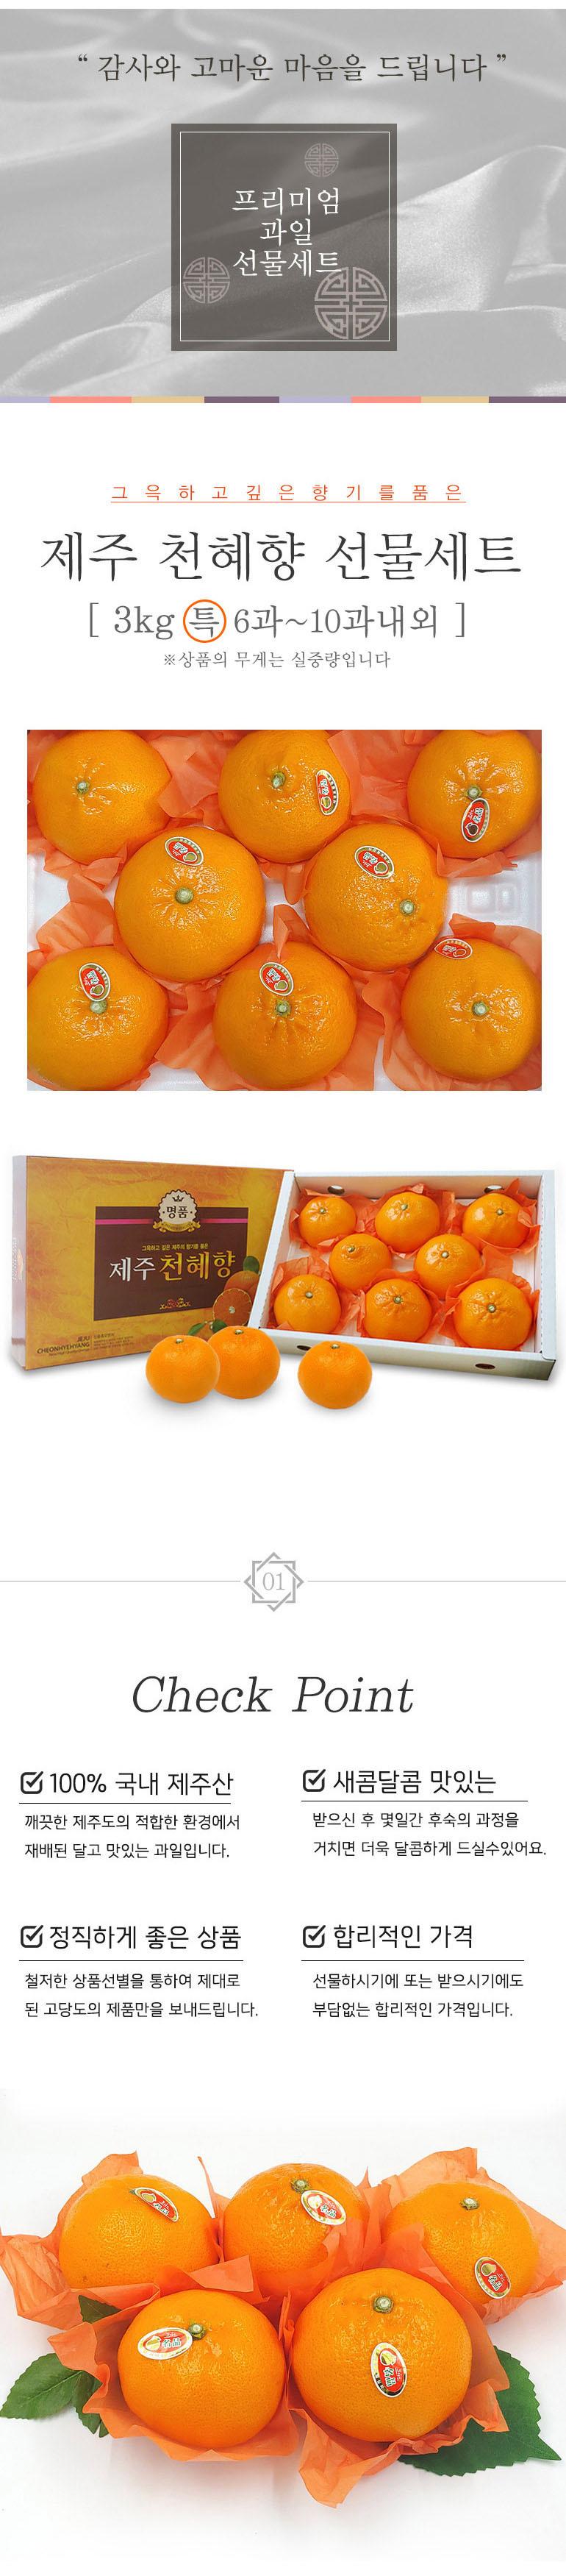 cheonhyehyang_01.jpg